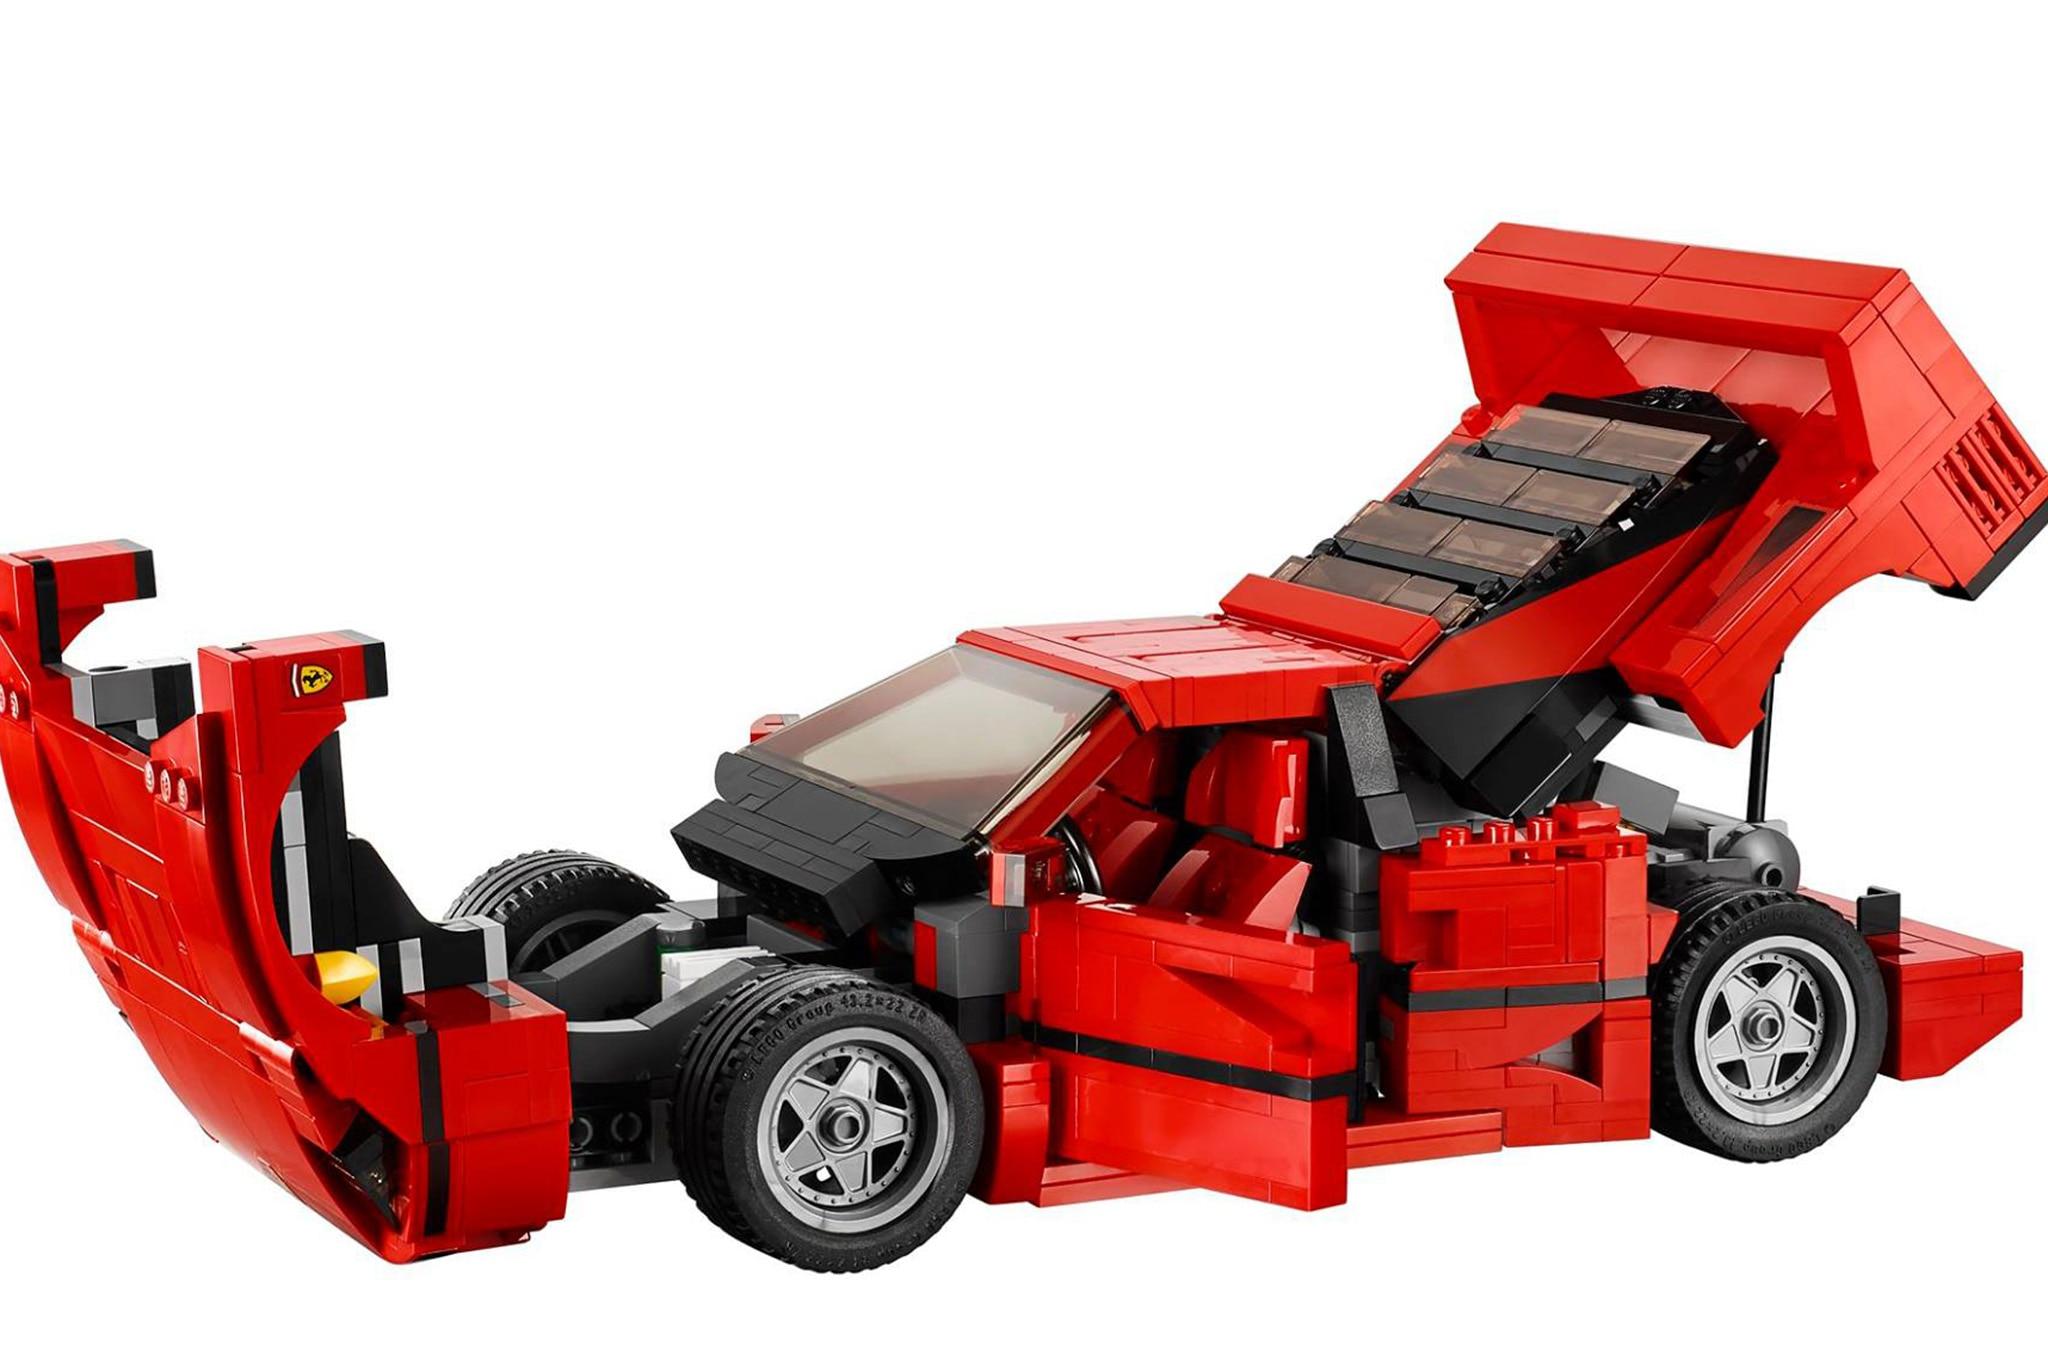 Lego Releases Detailed Ferrari F40 Creator Set